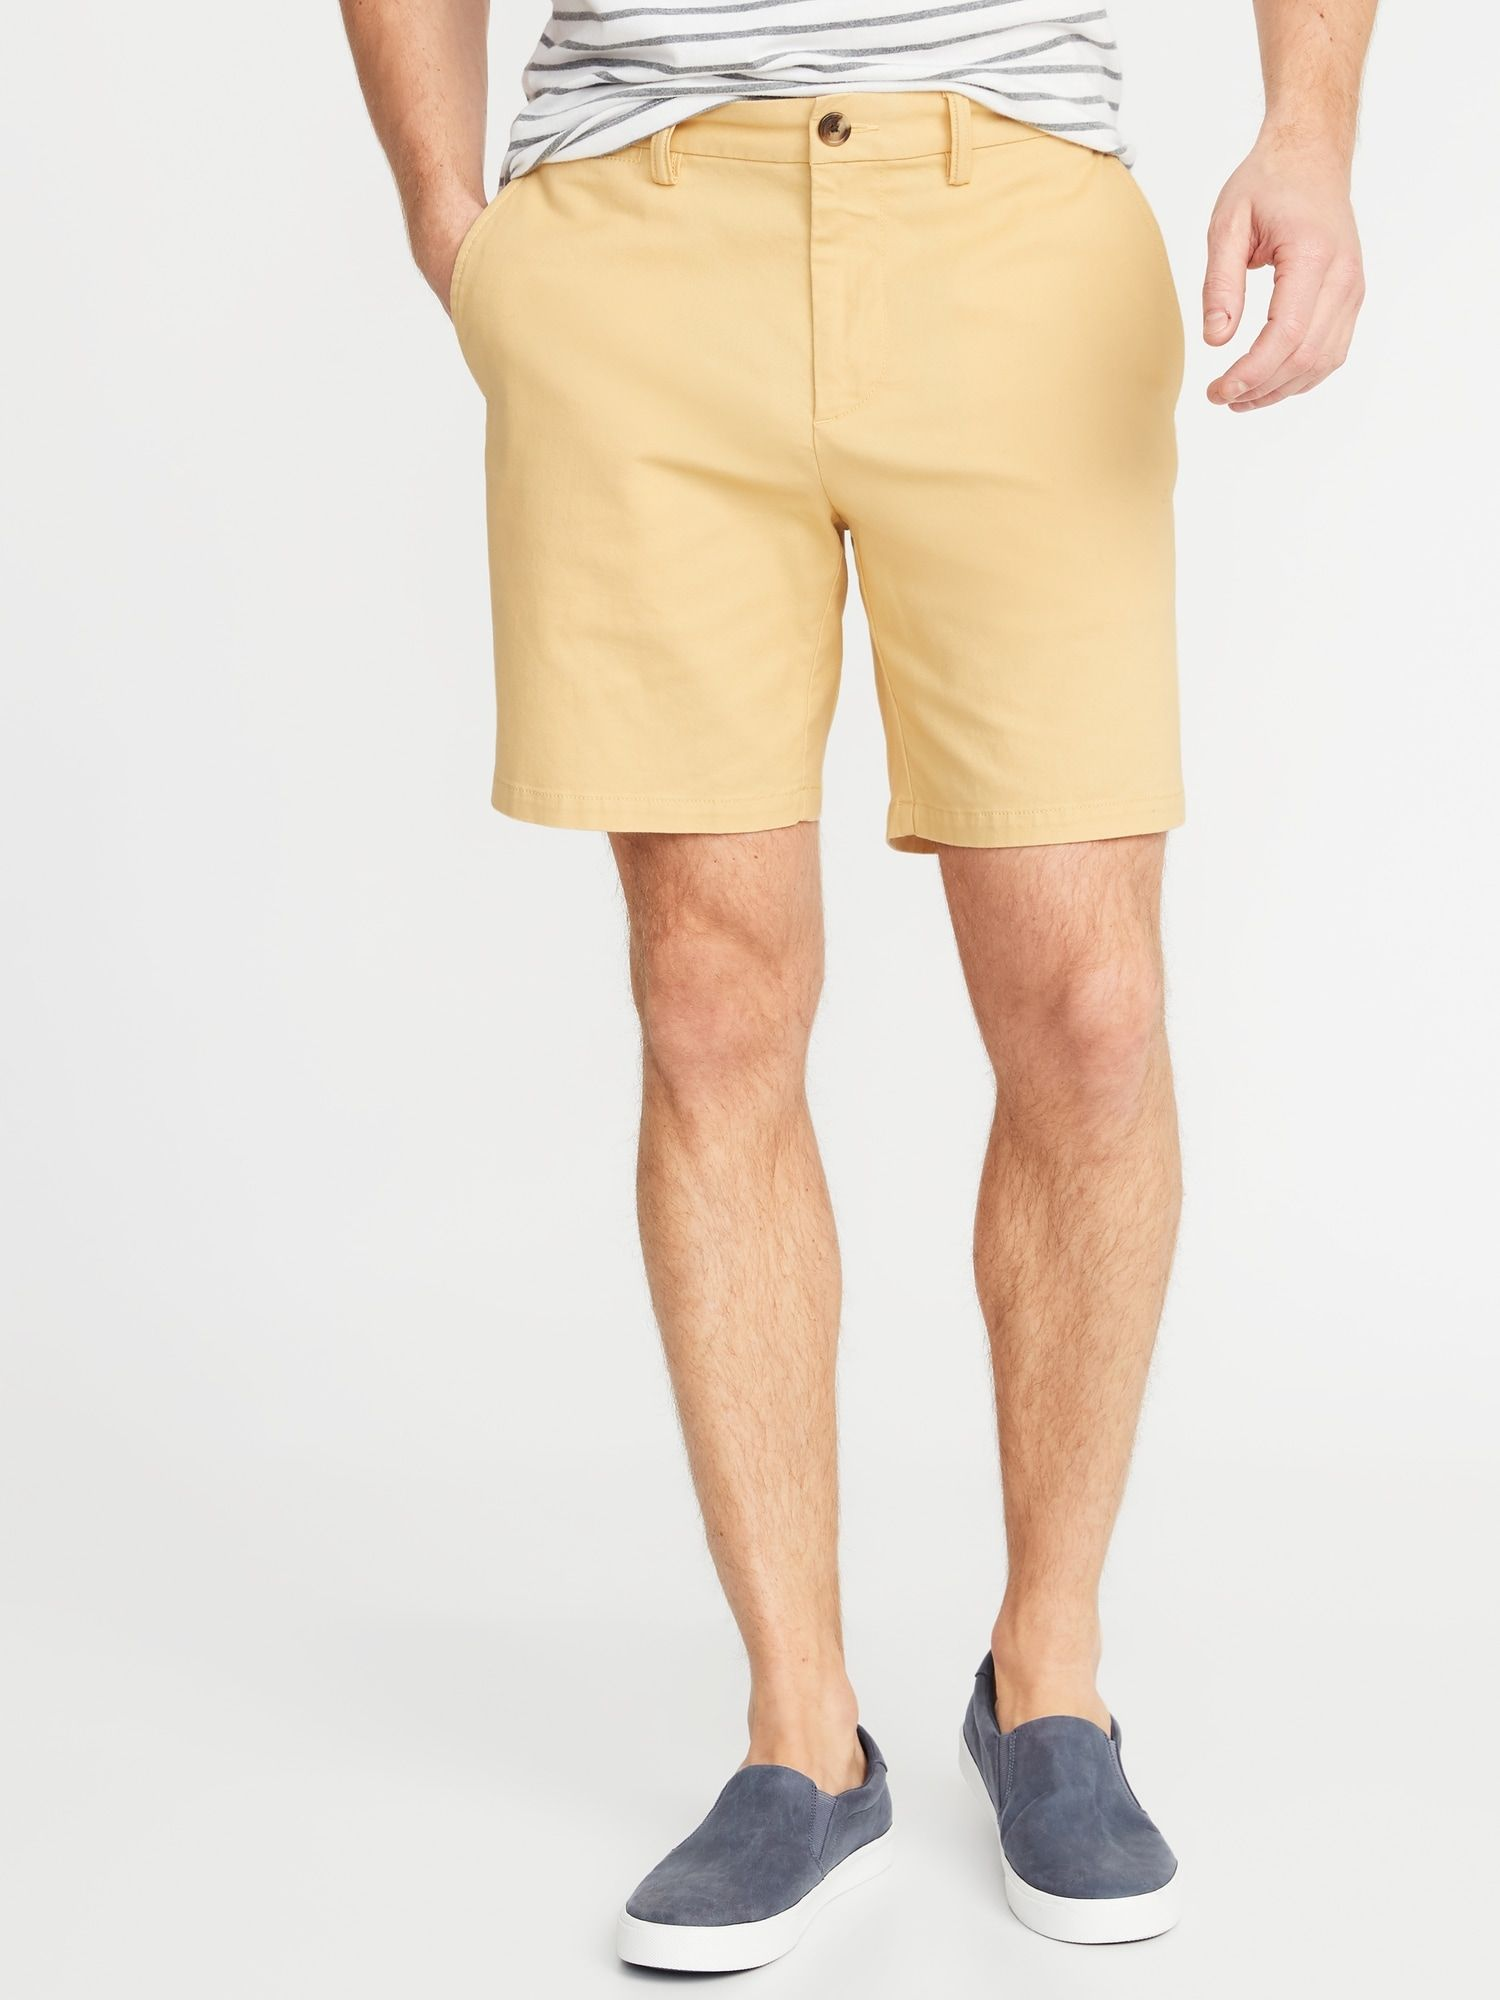 e8d4588fbc2 Ultimate Slim Built-In Flex Shorts for Men - 8-inch inseam